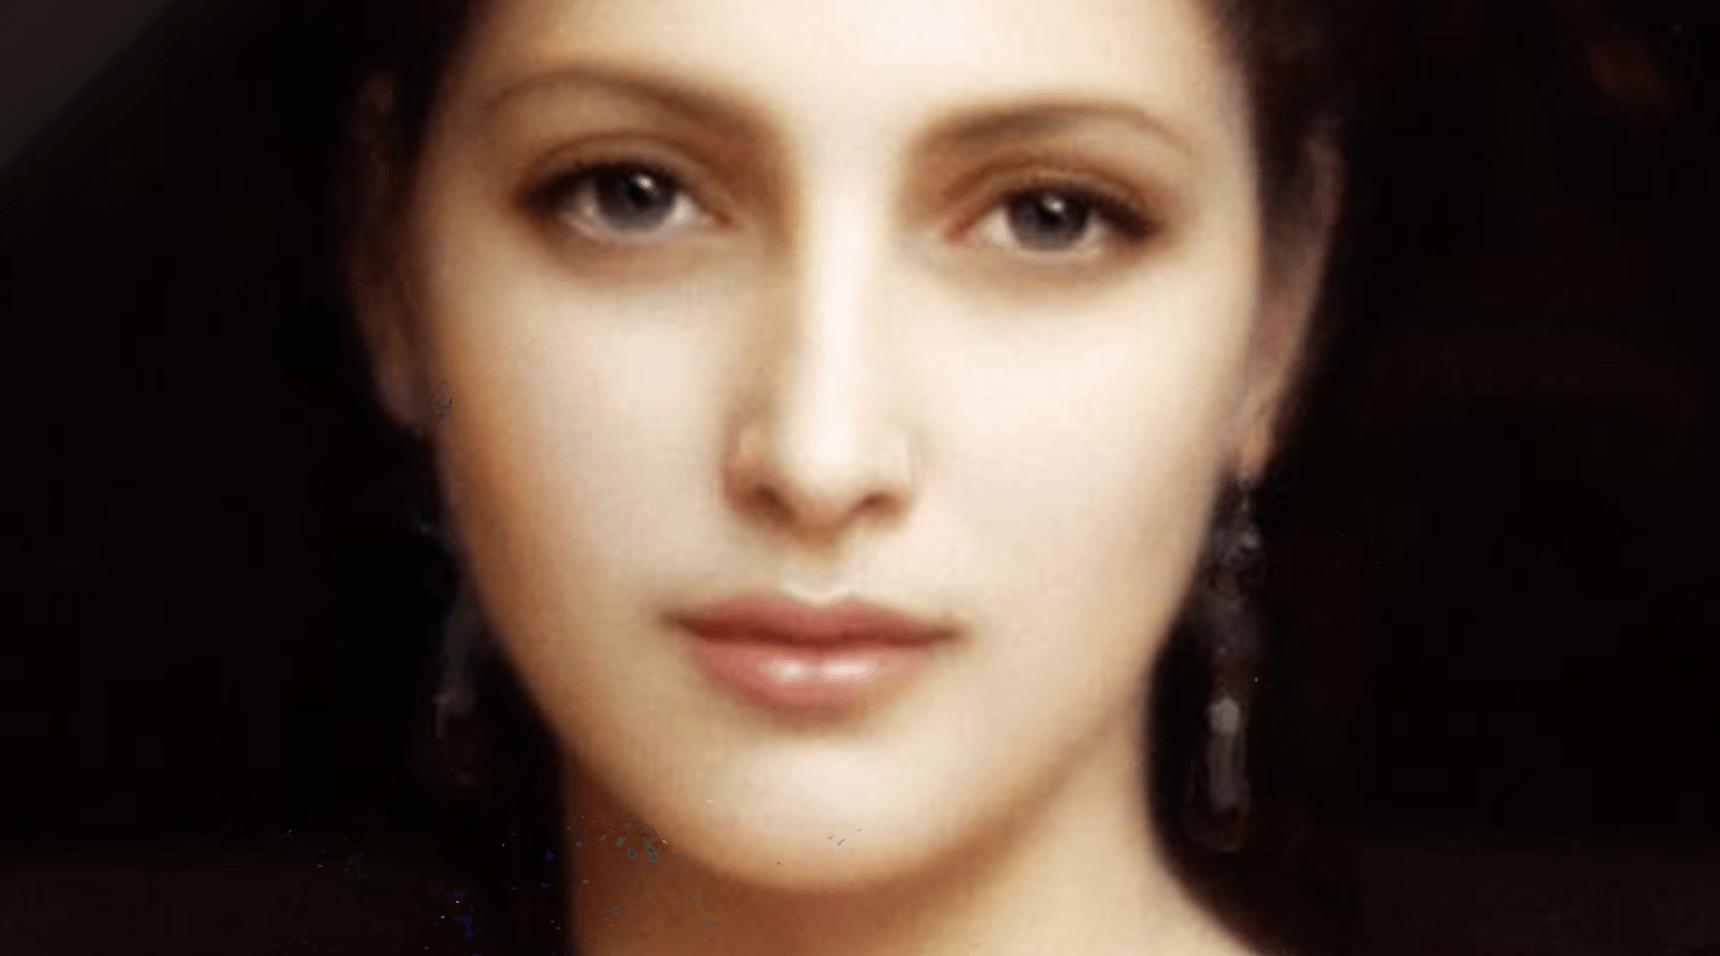 Aphrodite Eyes-Bouguereau-ParisBazaar-Ghis